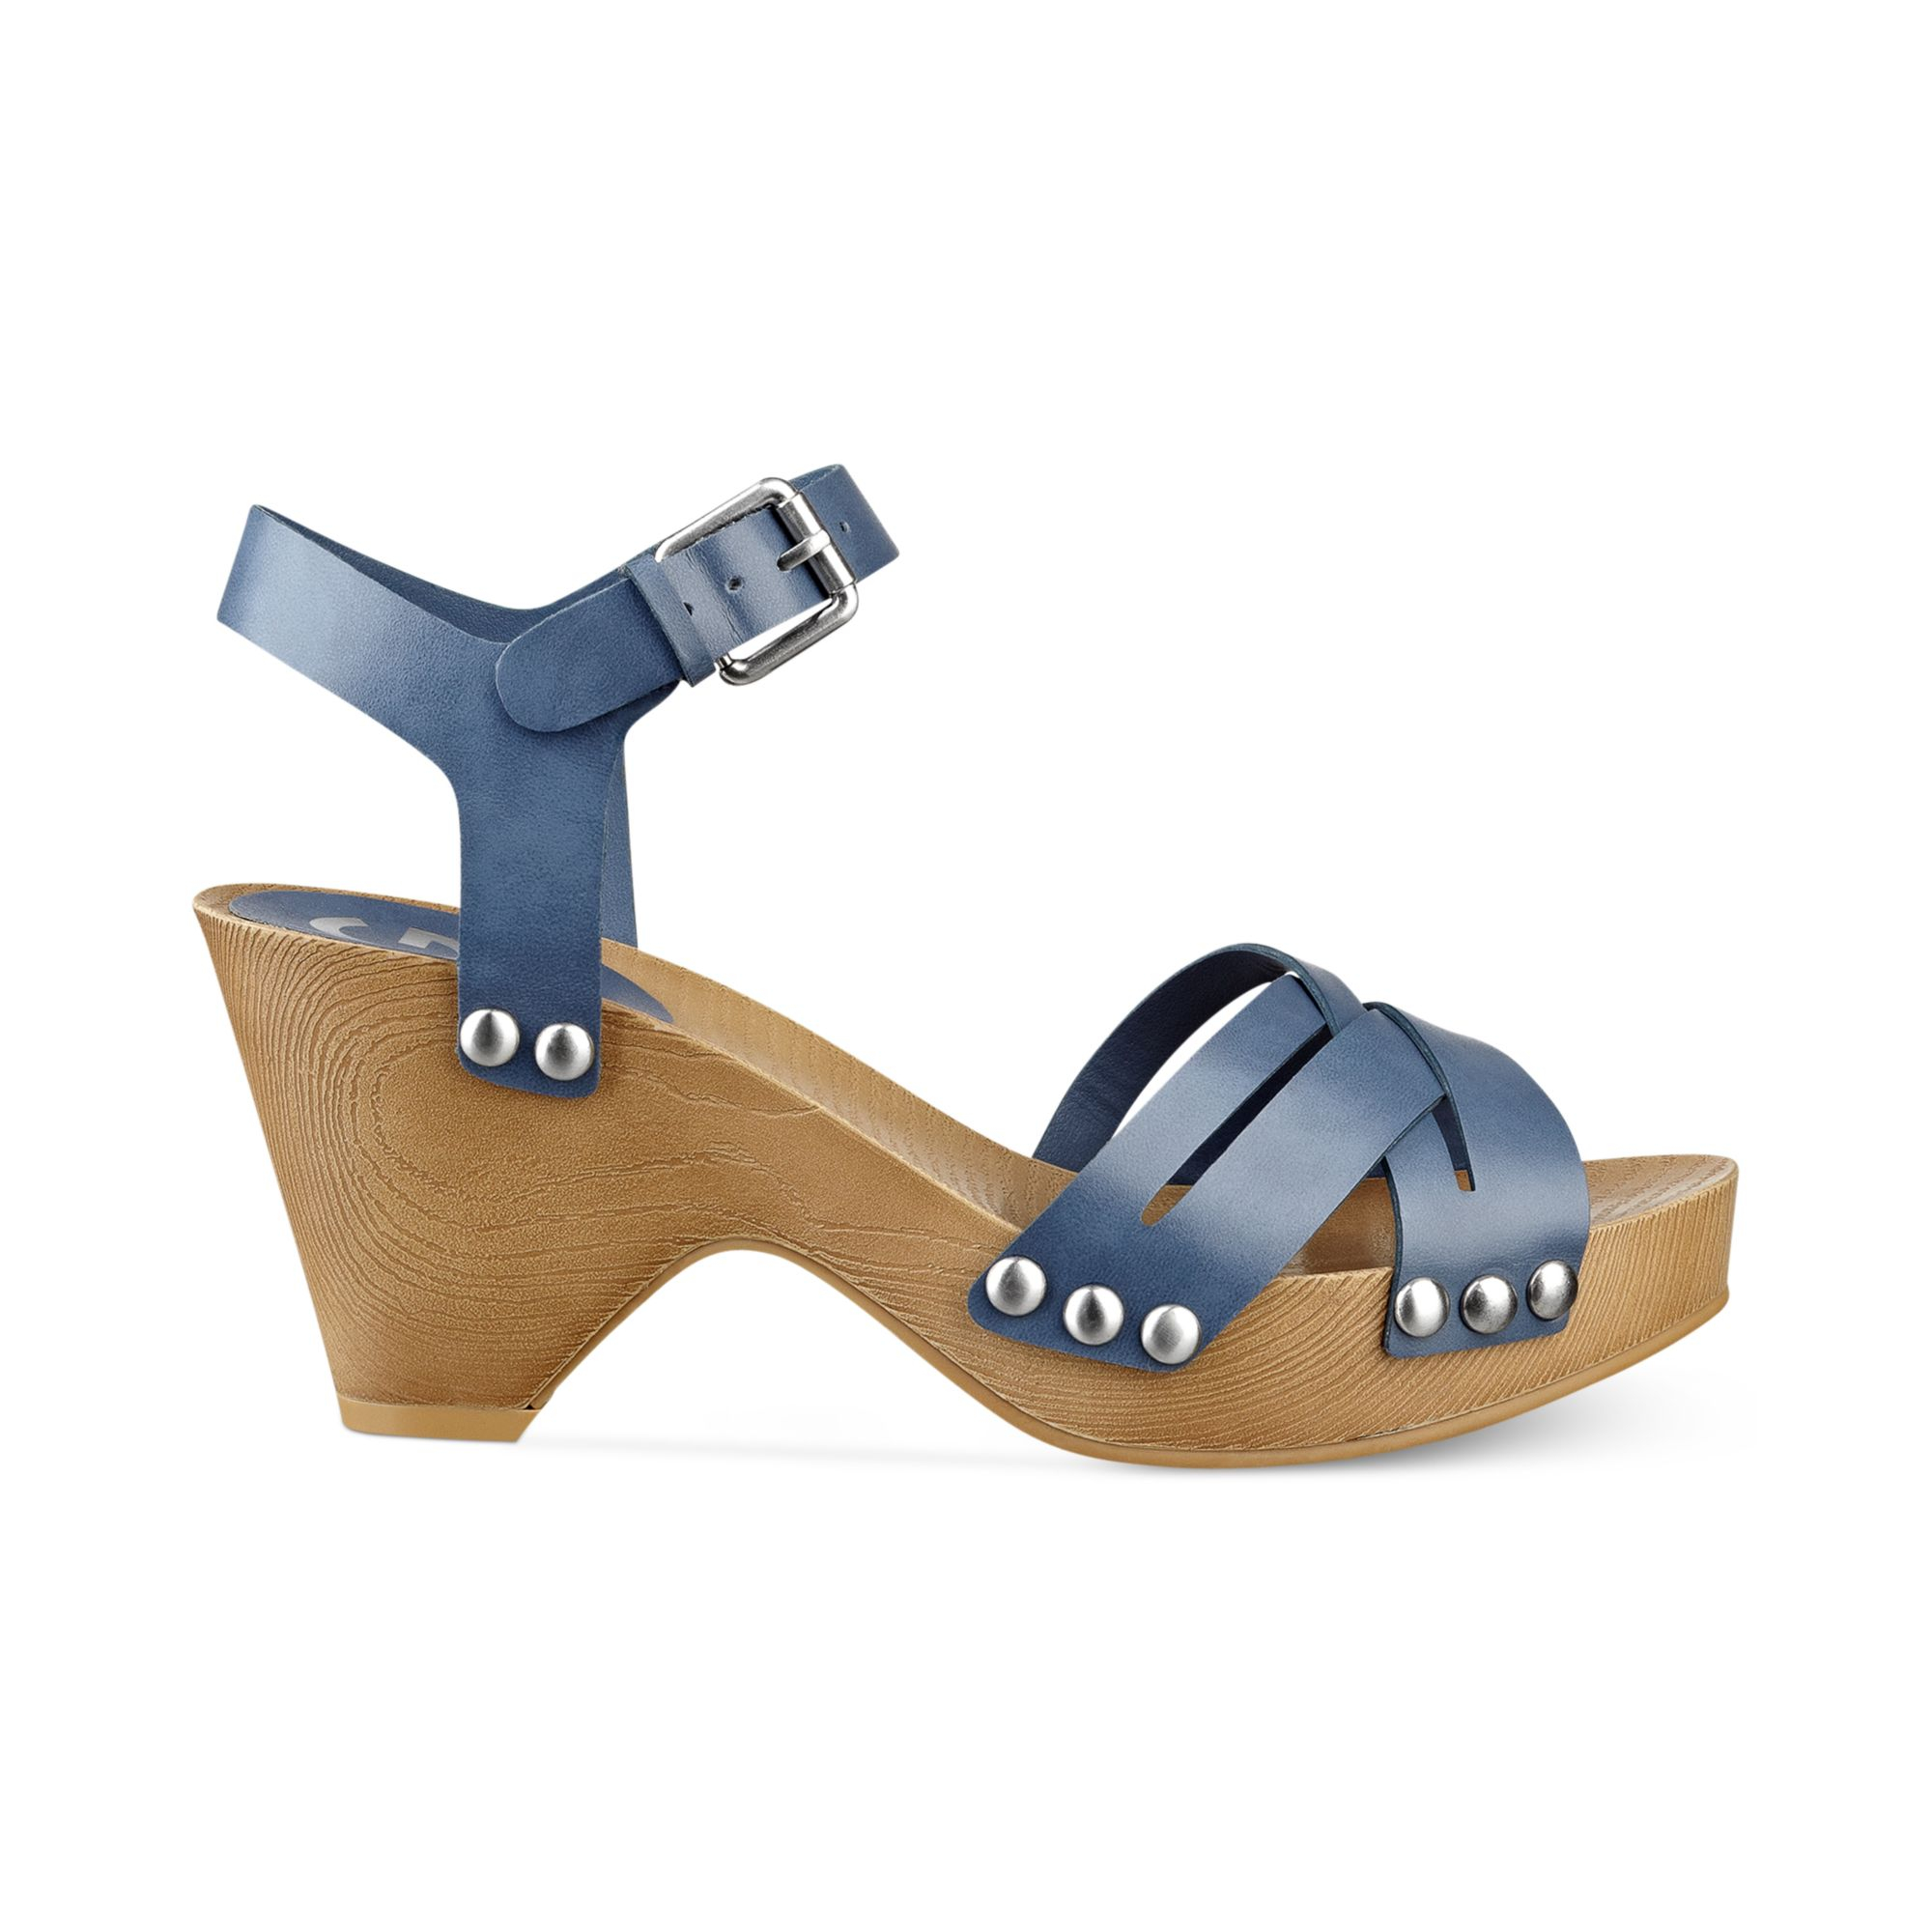 908d71b6e37df G by Guess Womens Jackal Platform Clog Sandals in Blue - Lyst